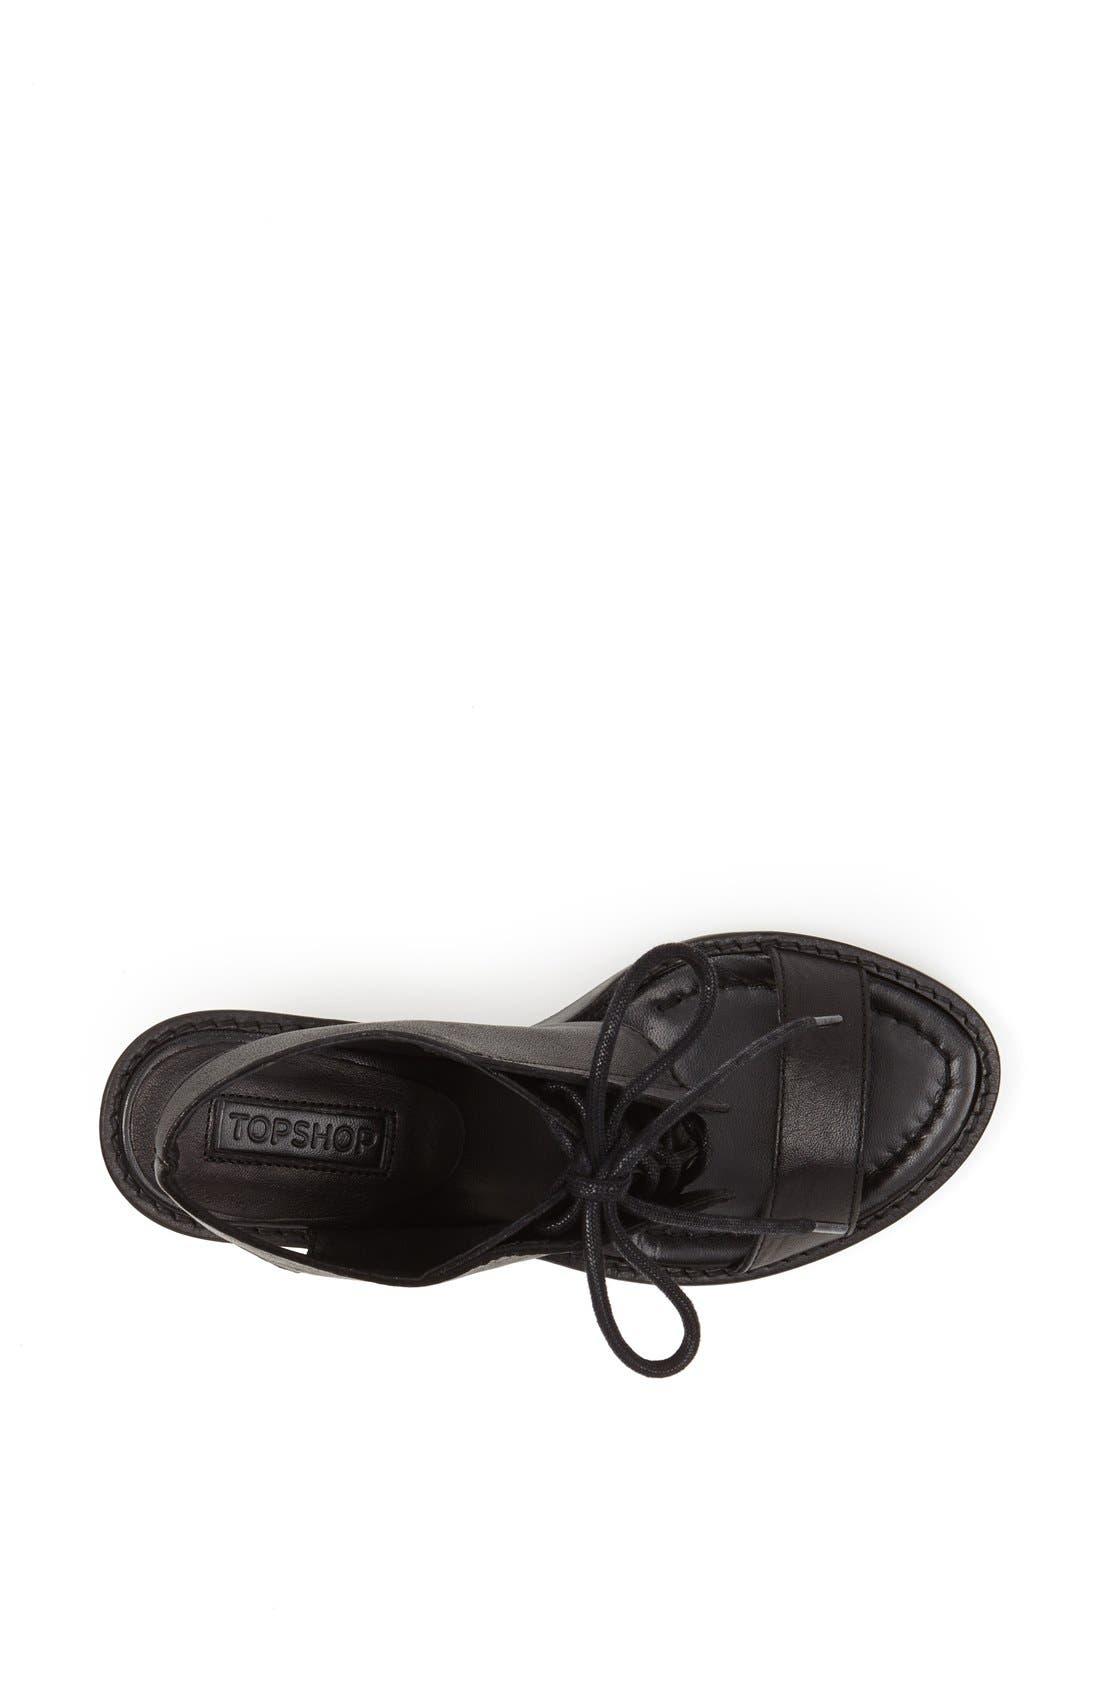 Alternate Image 3  - Topshop 'Nostalgic' Lace-Up Sandal